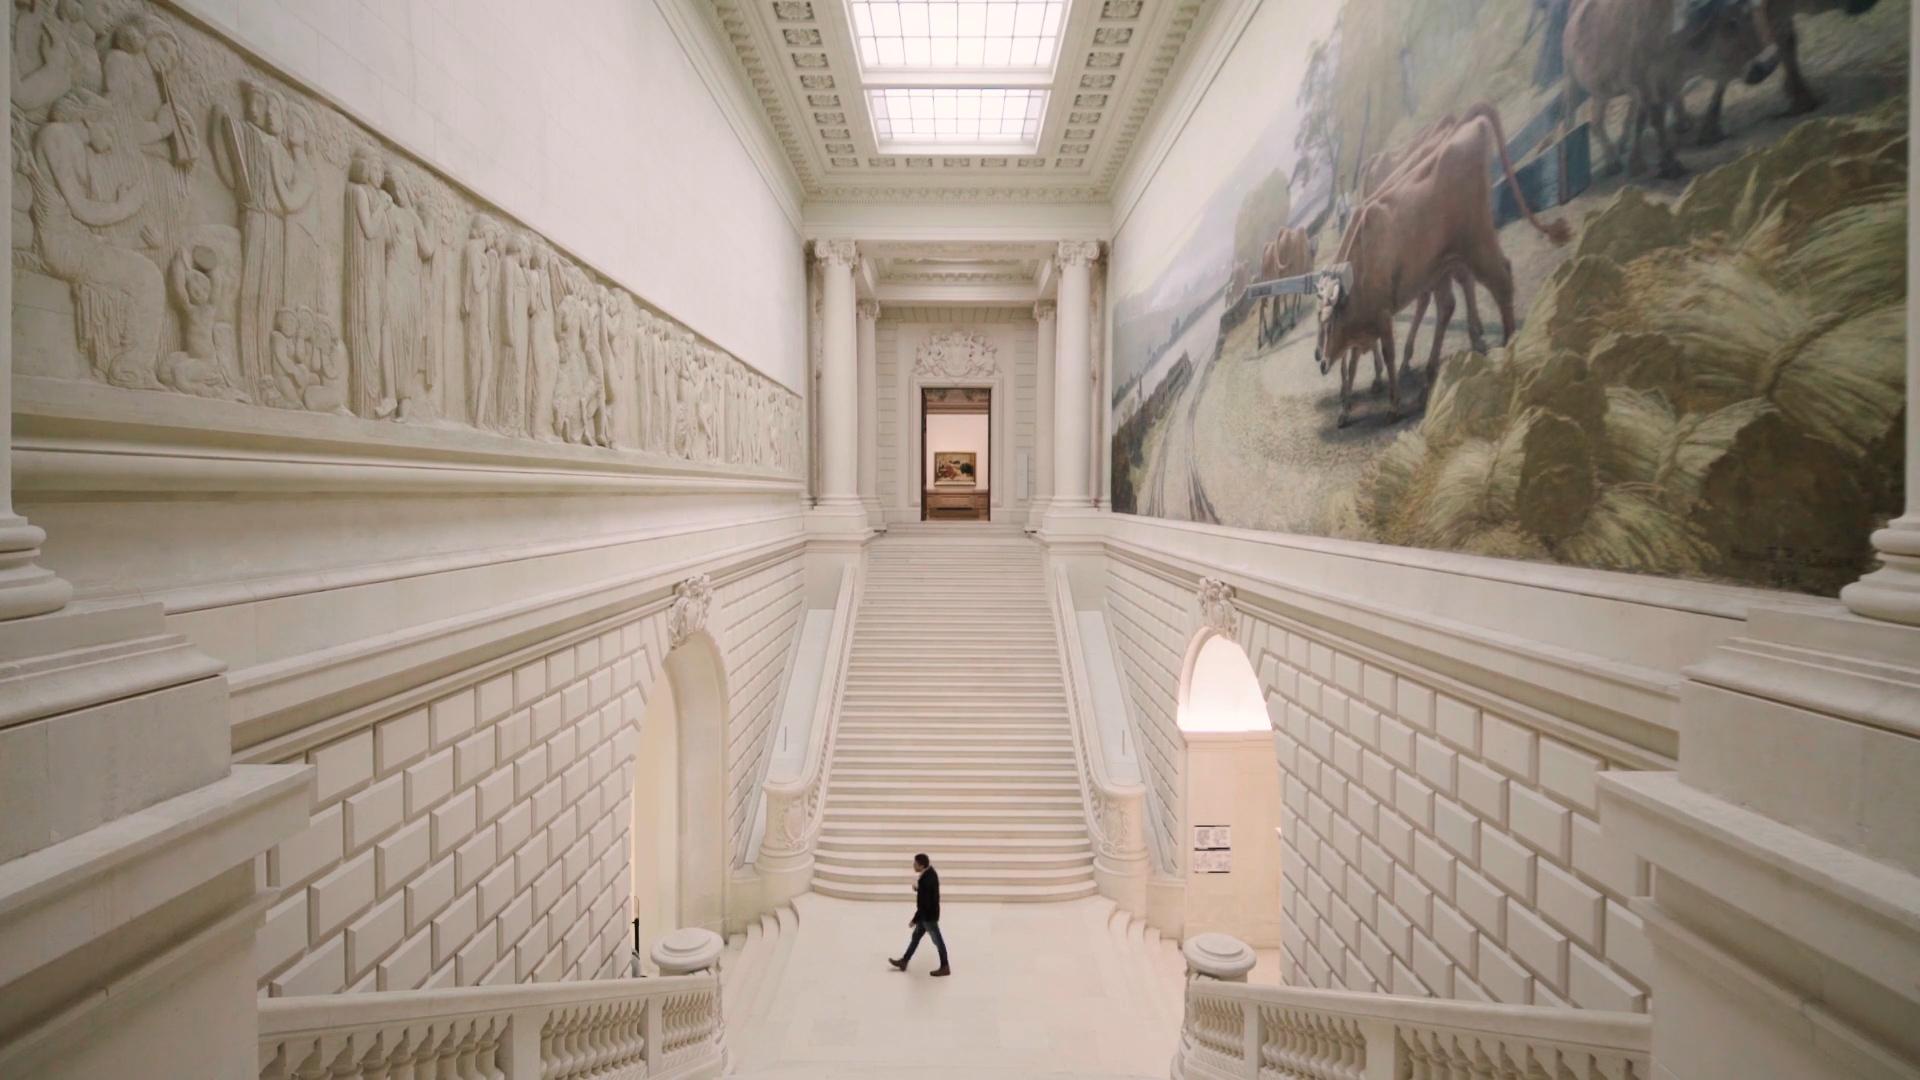 Musee d'arts de Nantes - Stanton Williams.mp4.00_01_53_22.Still007.jpg